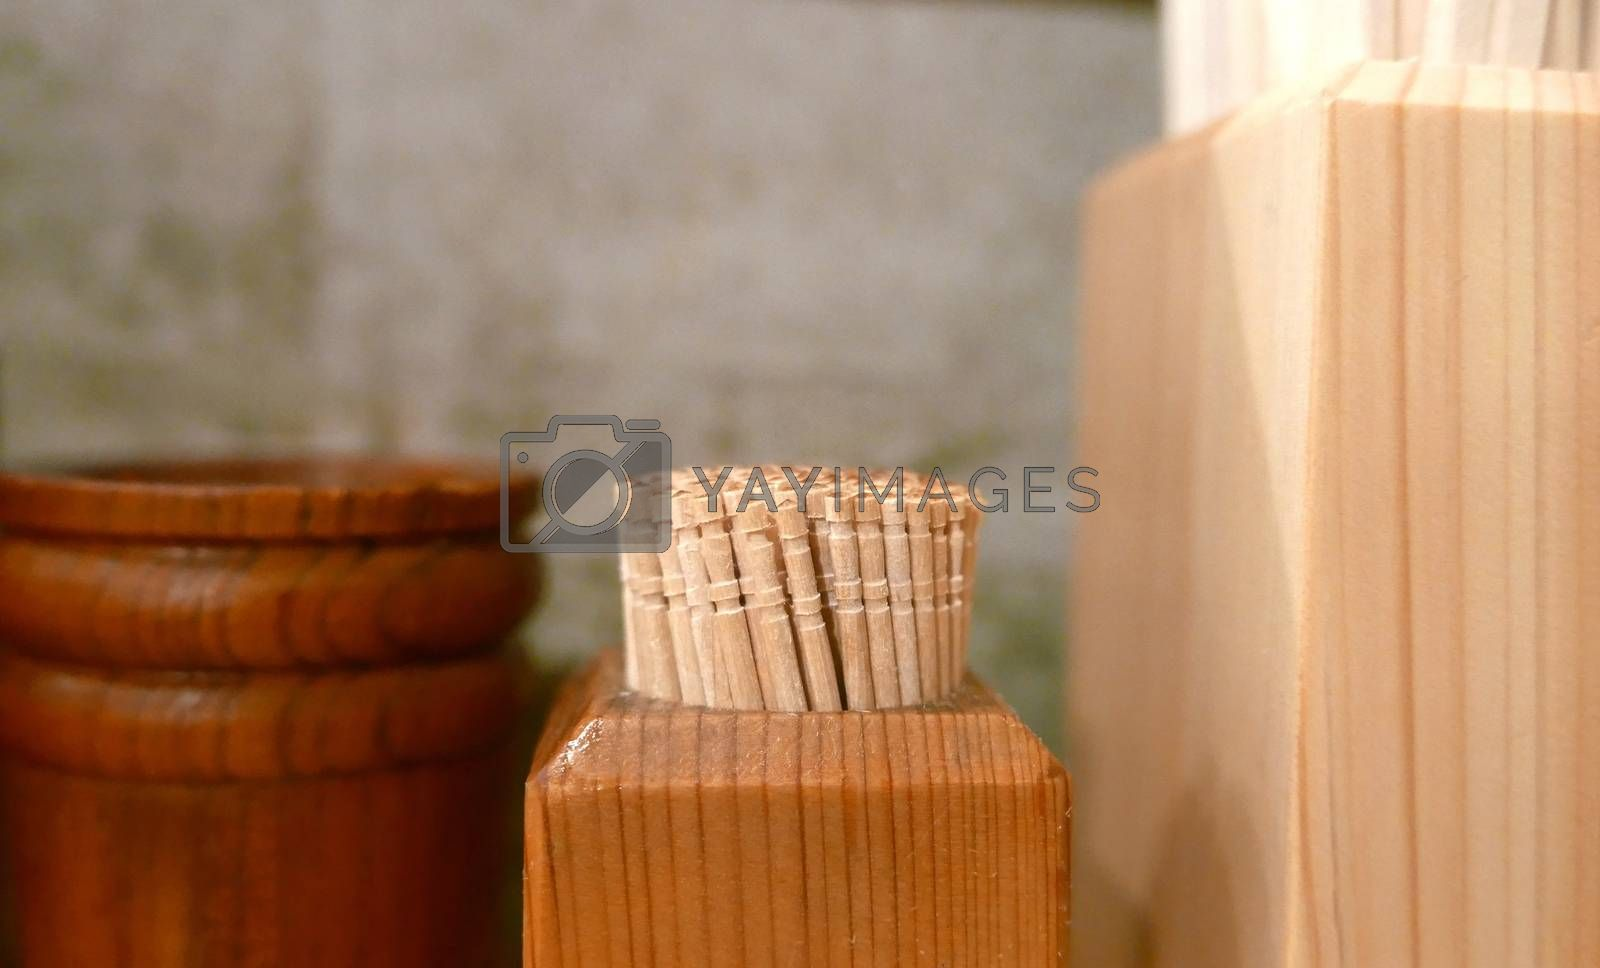 The box of toothpicks and chopsticks